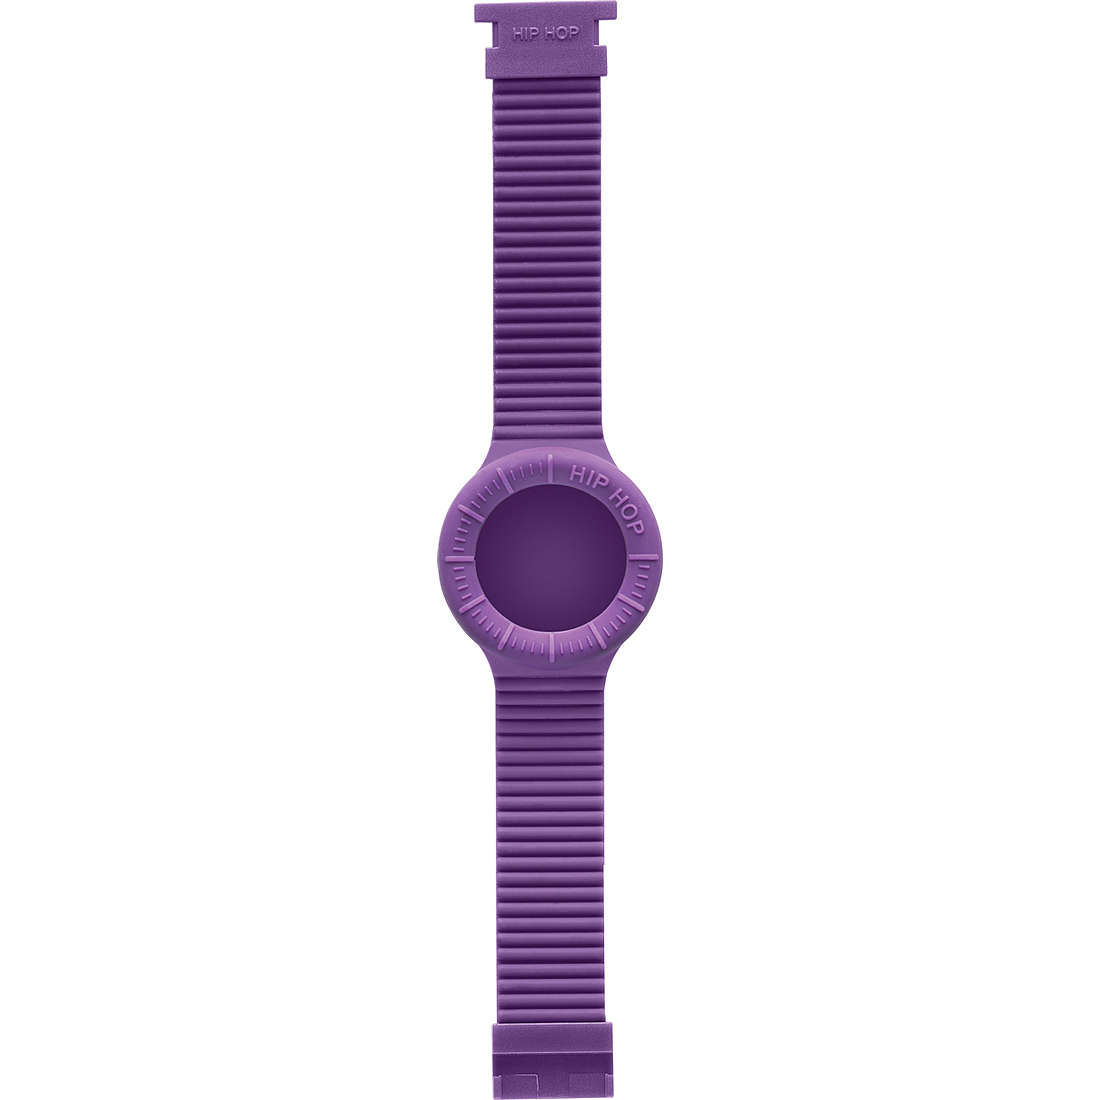 orologio cinturino orologio unisex Hip Hop Multifunzione HBU0182